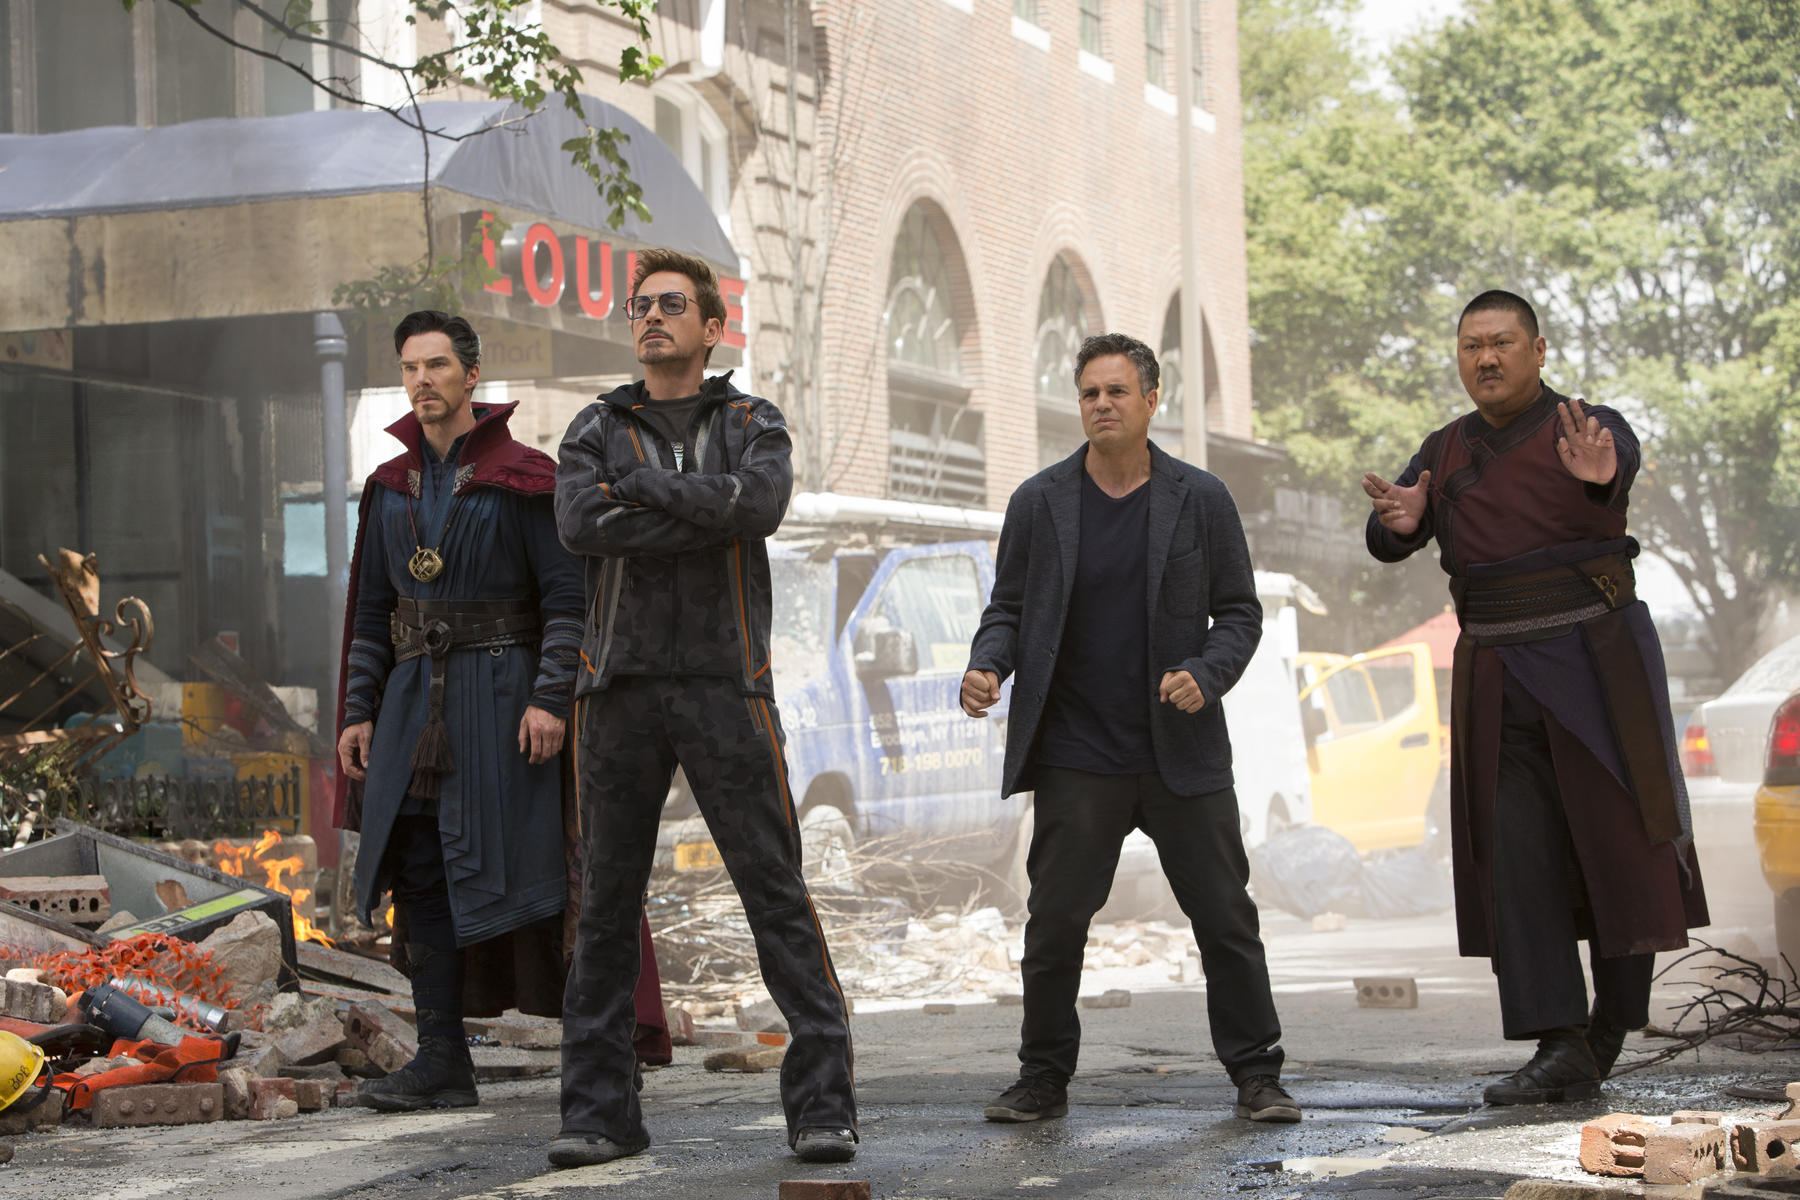 avengers-3-infinity-war-mit-robert-downey-jr-benedict-cumberbatch-mark-ruffalo-und-benedict-wong